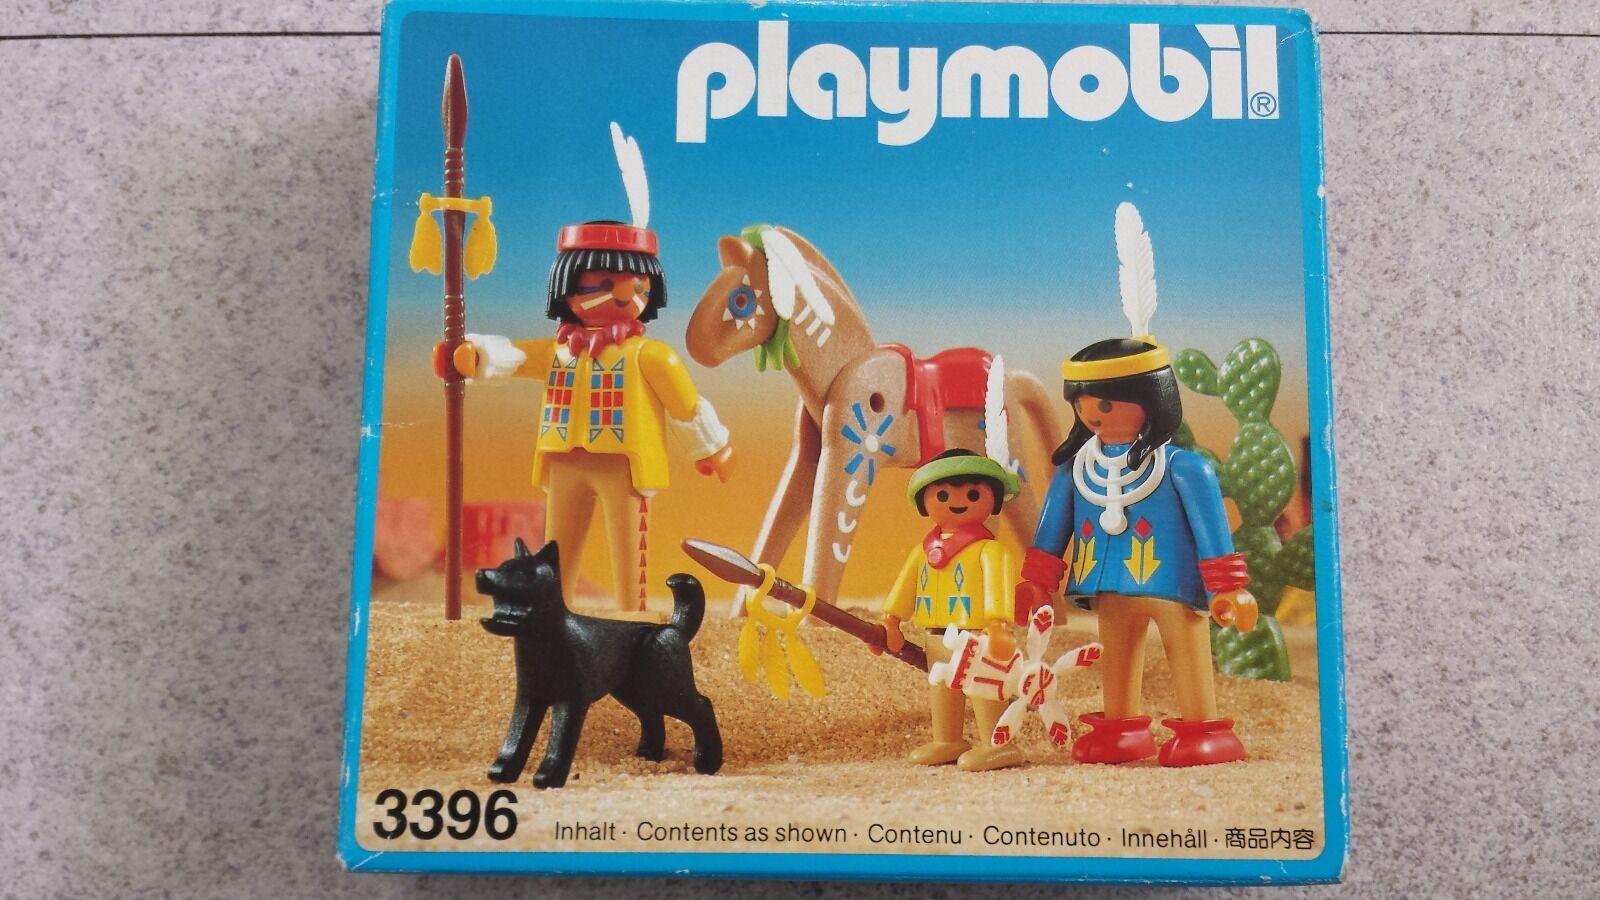 Playmobil Playmobil Playmobil 3396 b57a62